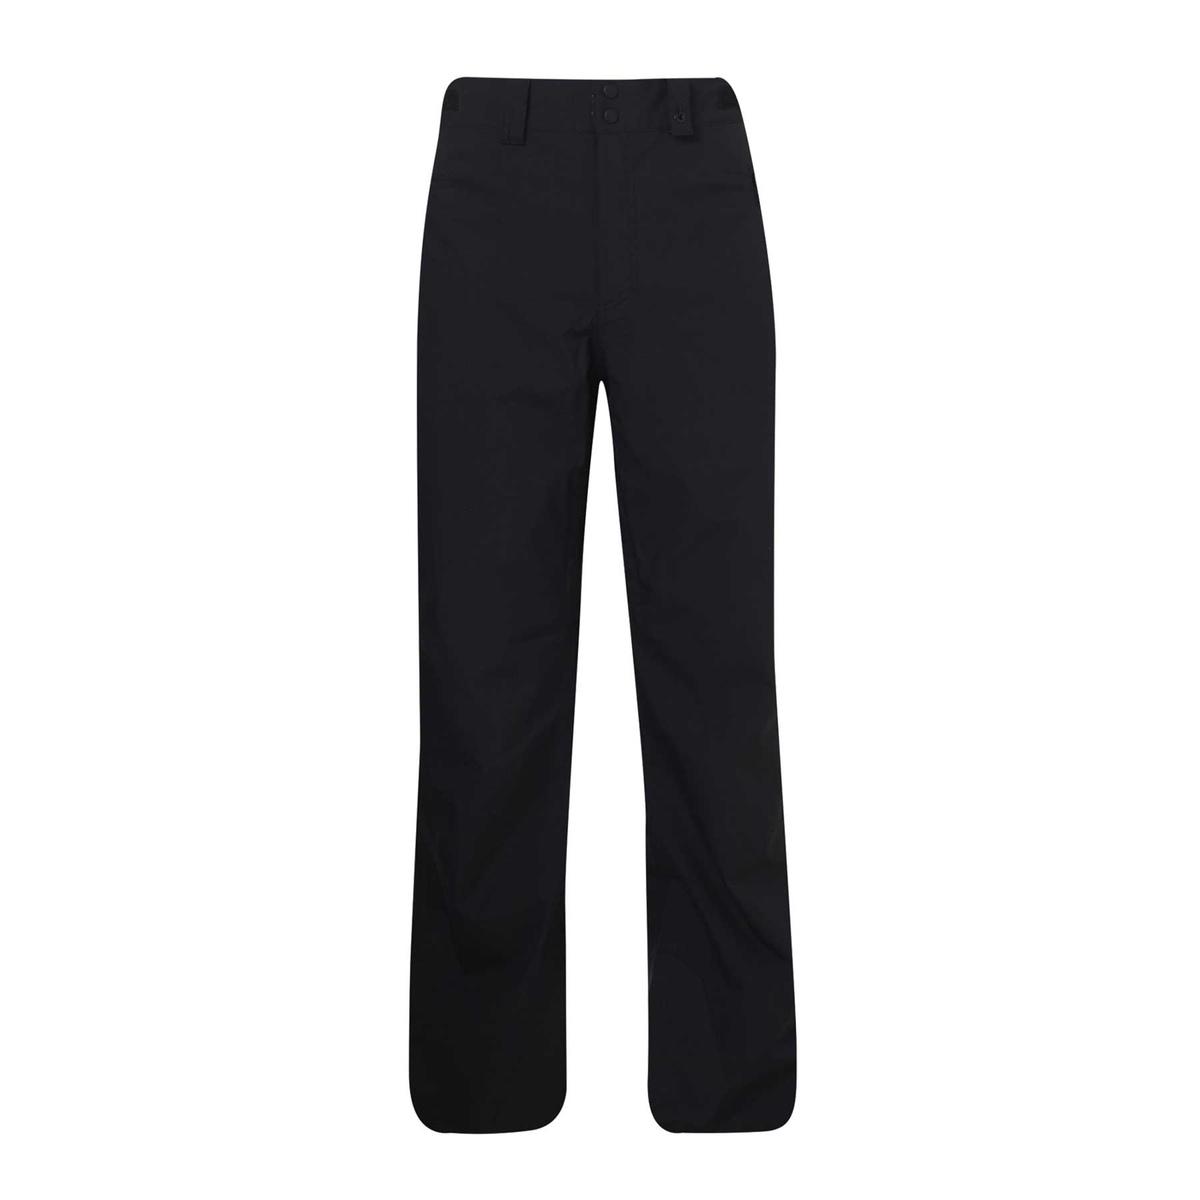 Prezzi Oakley pantaloni crescent 3.0